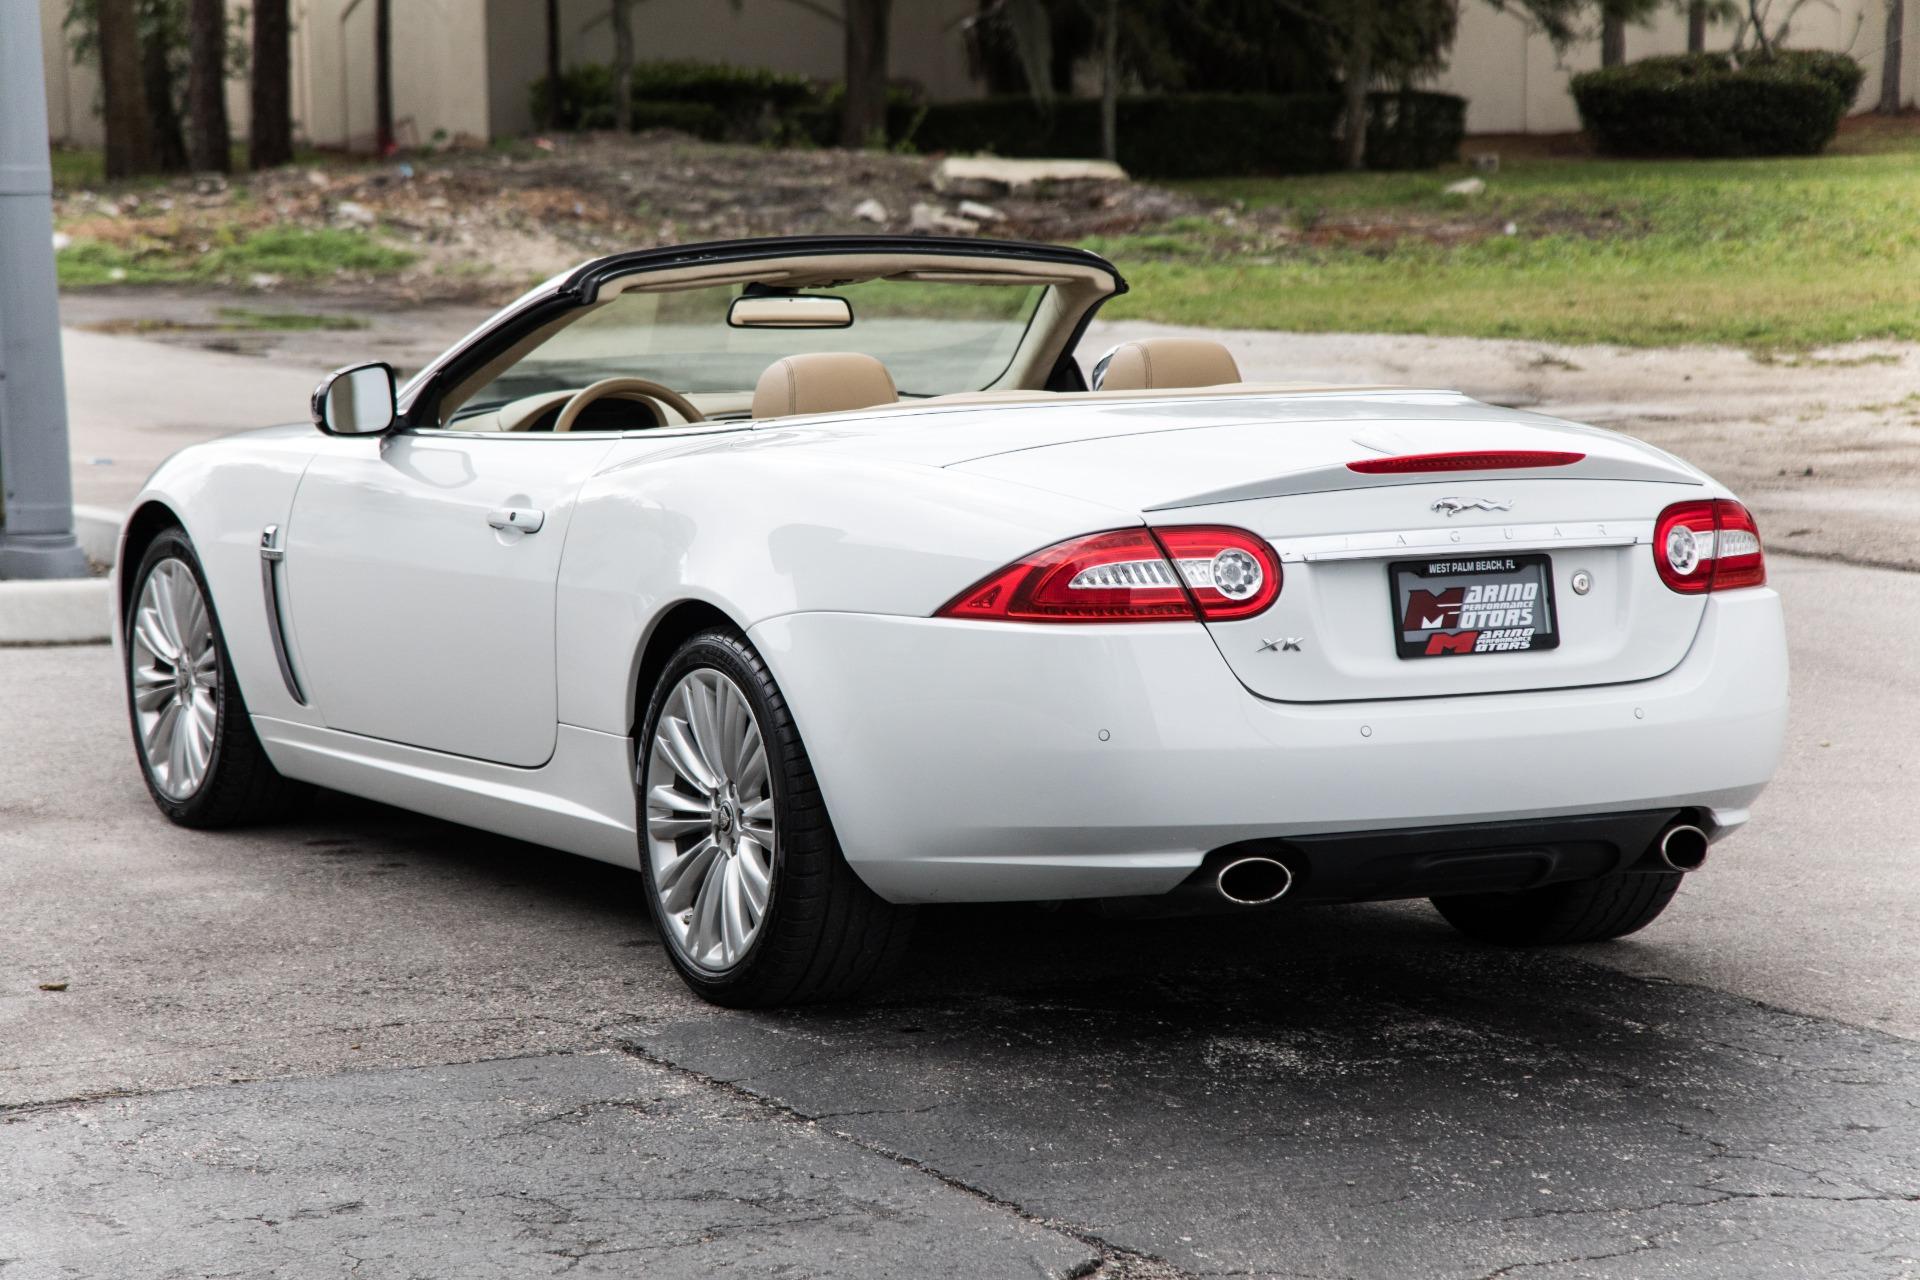 Used 2011 Jaguar XK For Sale ($32,900) | Marino ...